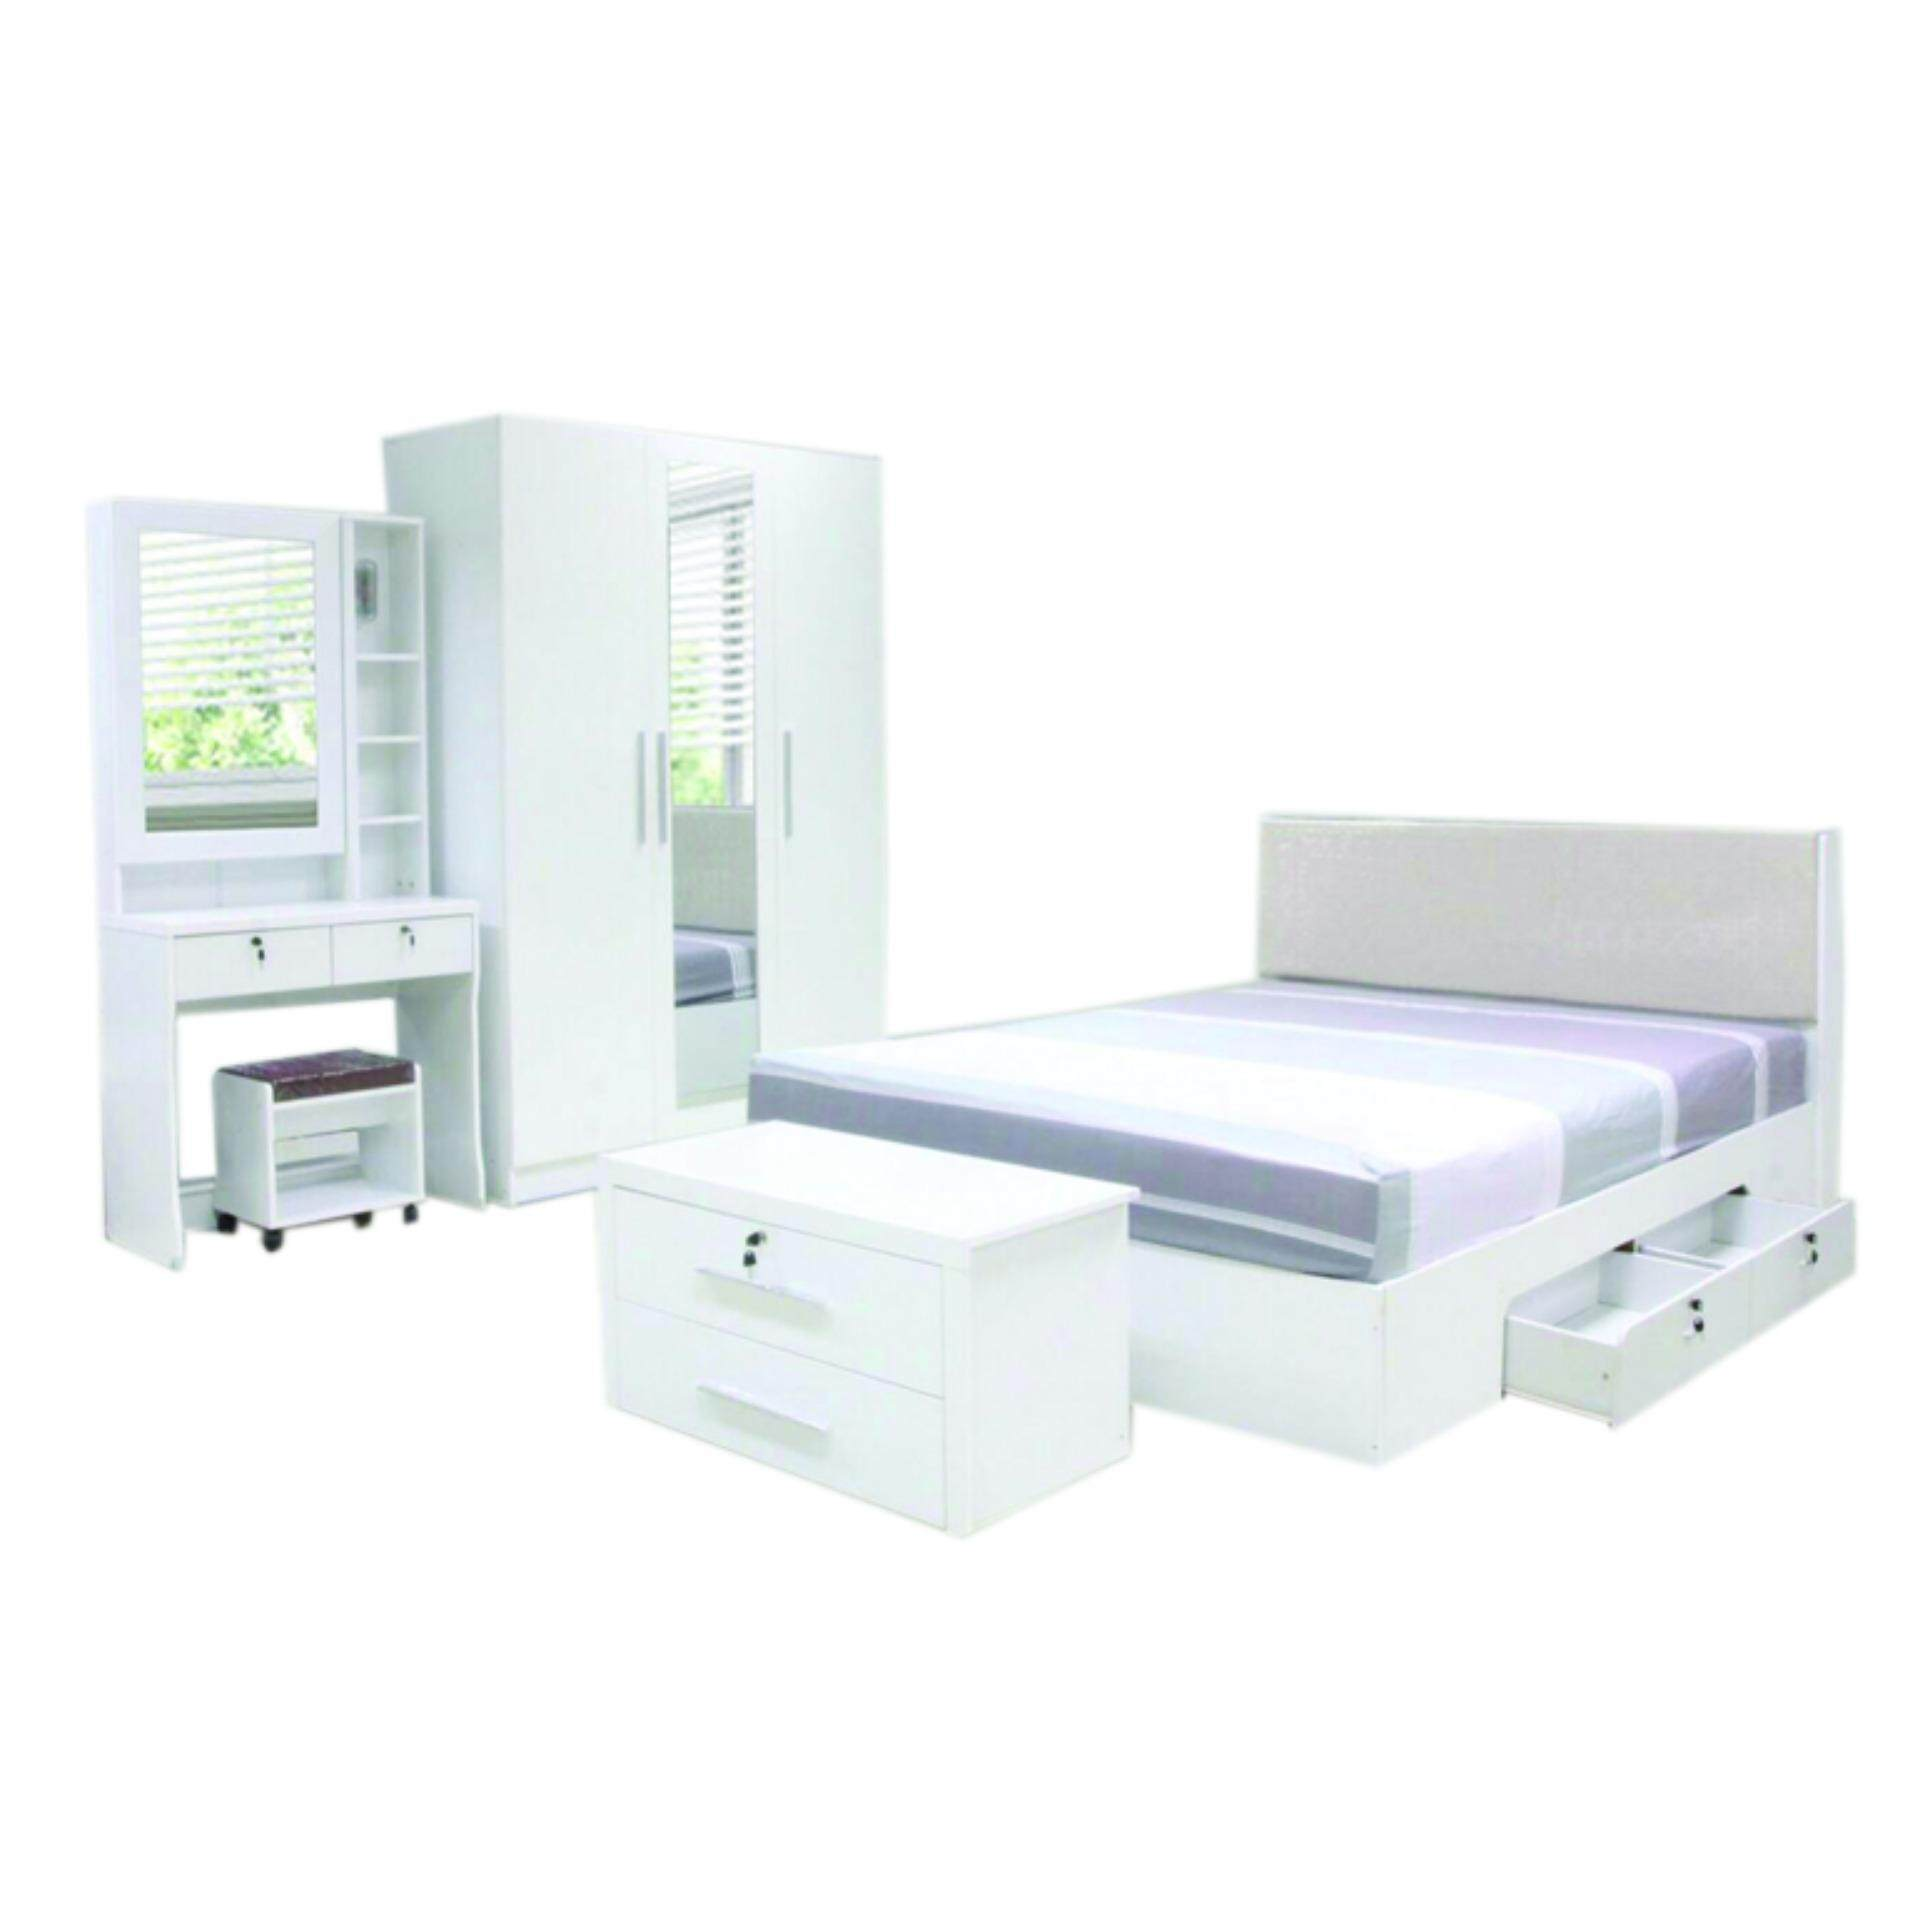 RF Furniture ชุดห้องนอน DD รุ่น Milan Set ขนาด 6 ฟุต เตียง 6 ฟุต +  ตู้เสื้อผ้า 3 บาน + โต๊ะแป้ง 80 Cm ( สีขาว ) | Lazada.co.th